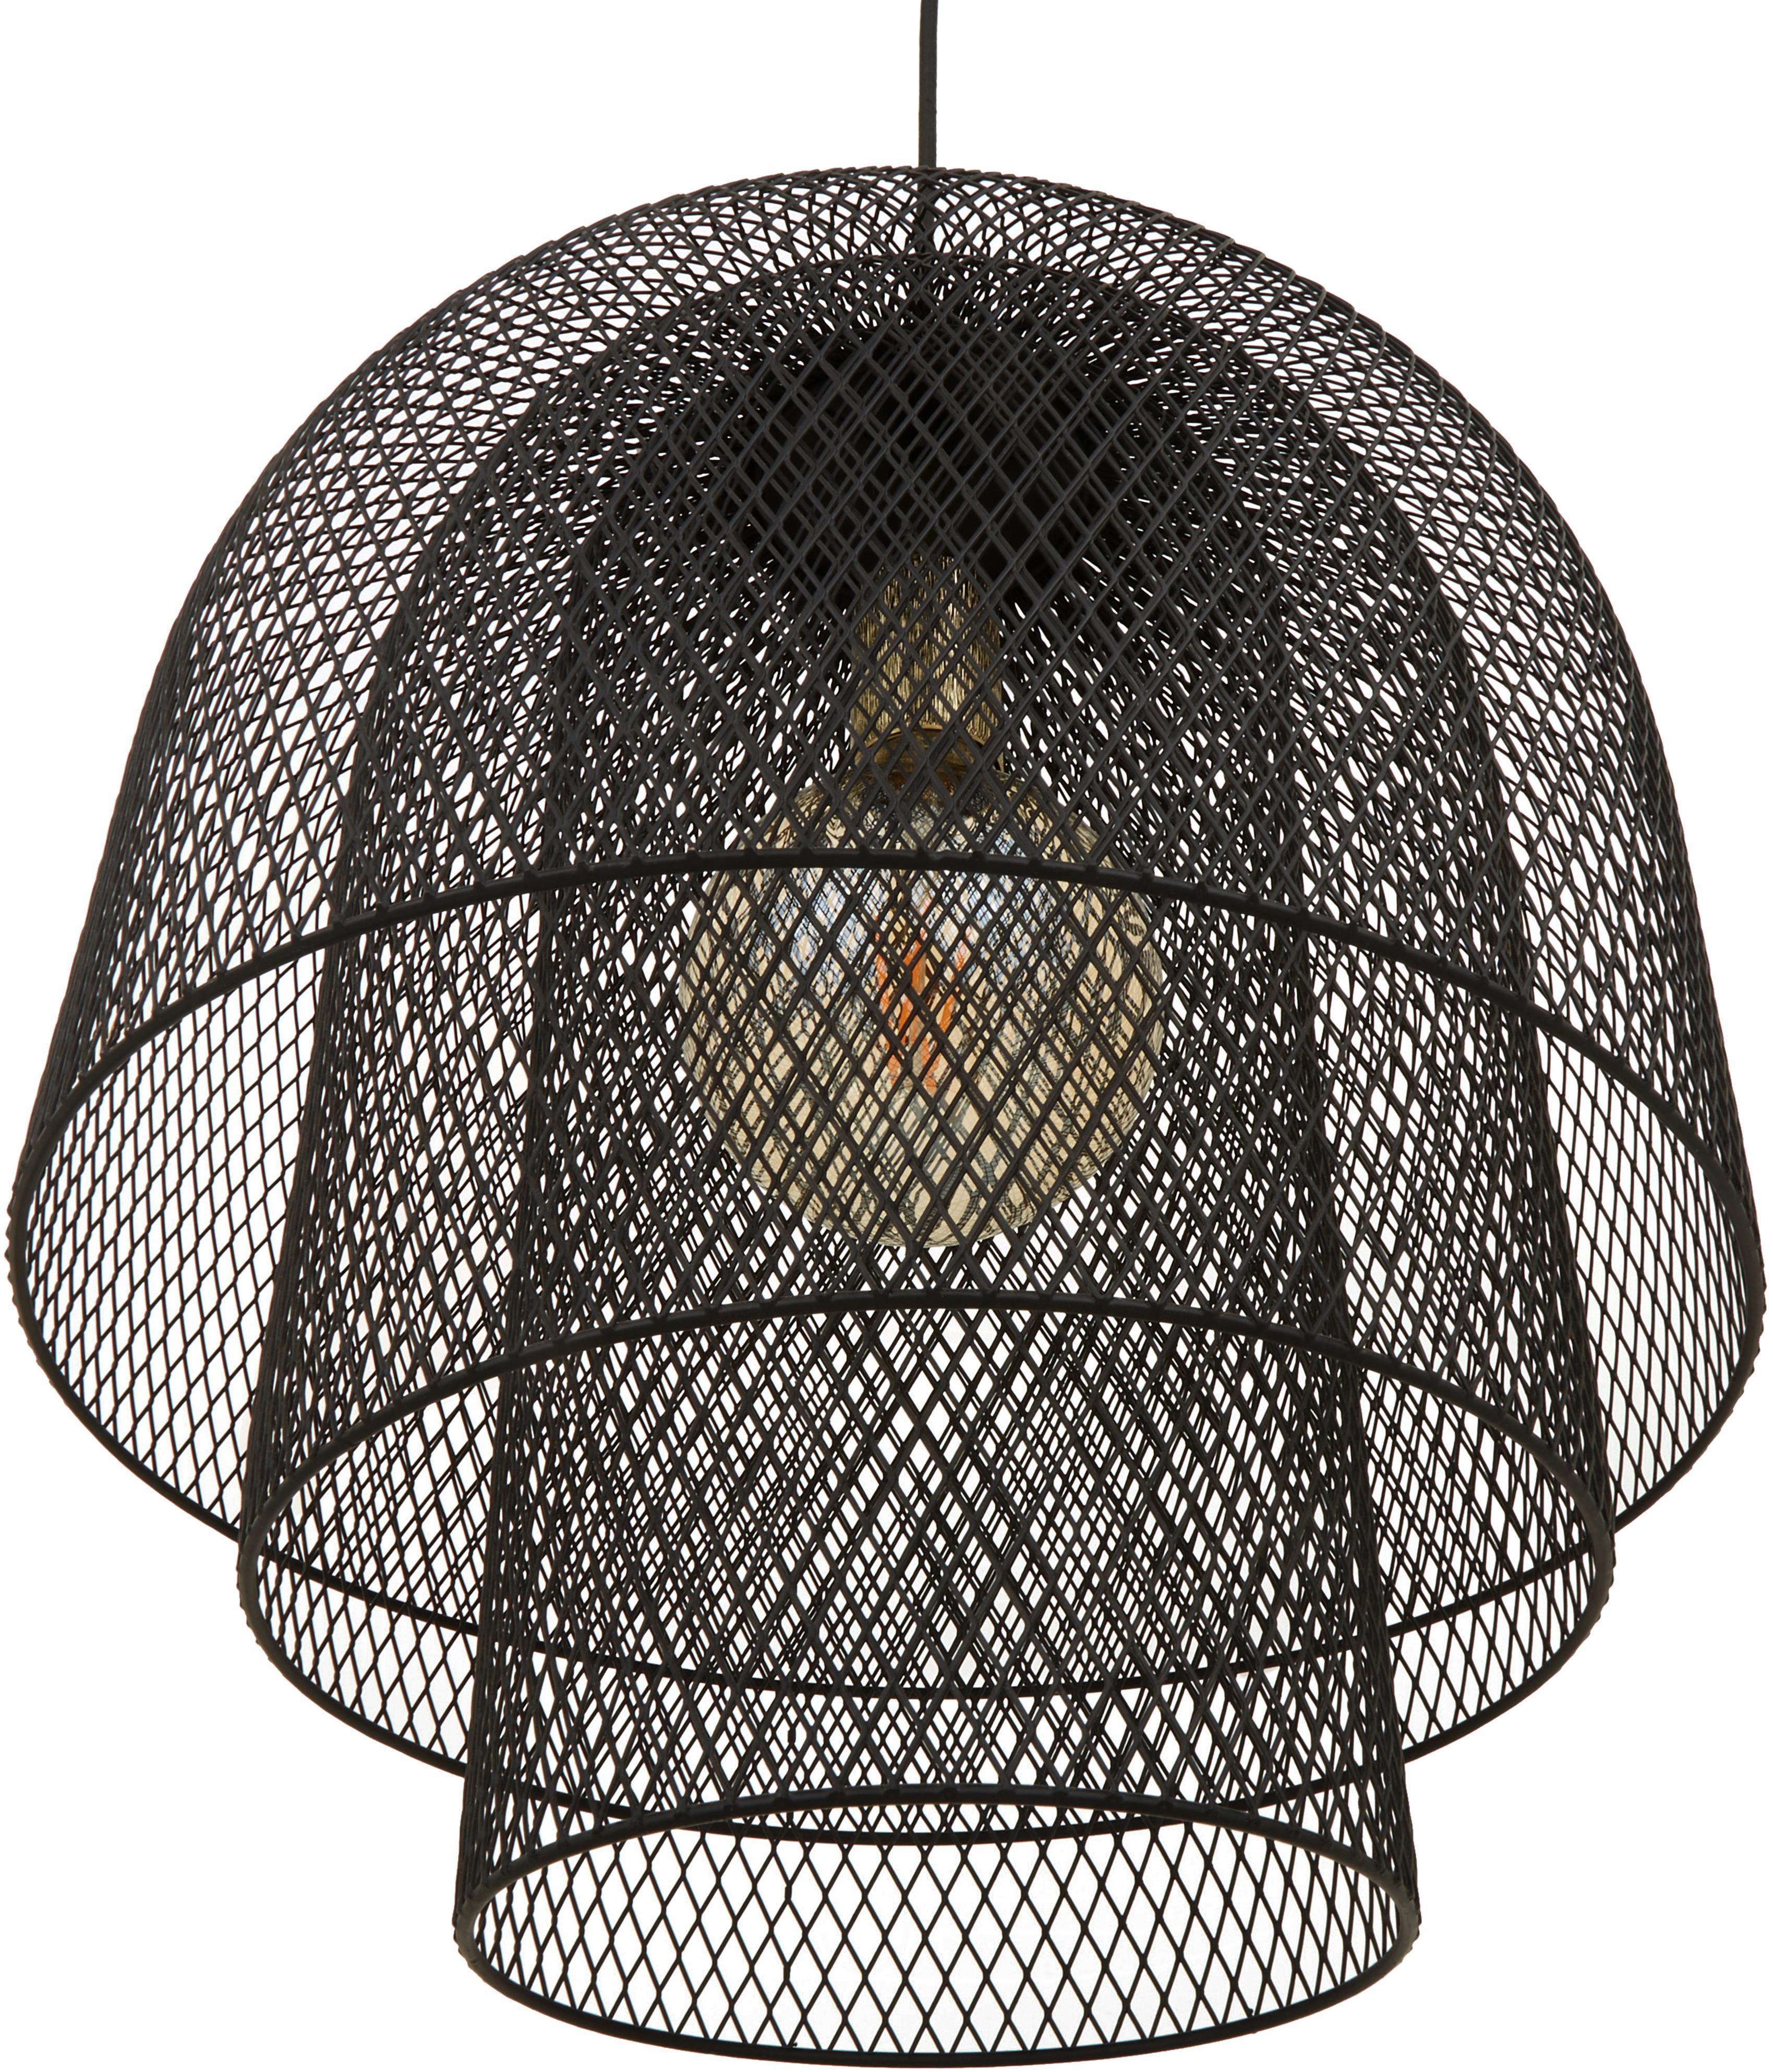 Hanglamp Louie in zwart, Baldakijn, lampframe en lampenkap: mat zwart. Snoer: zwart, Ø 40 x H 43 cm